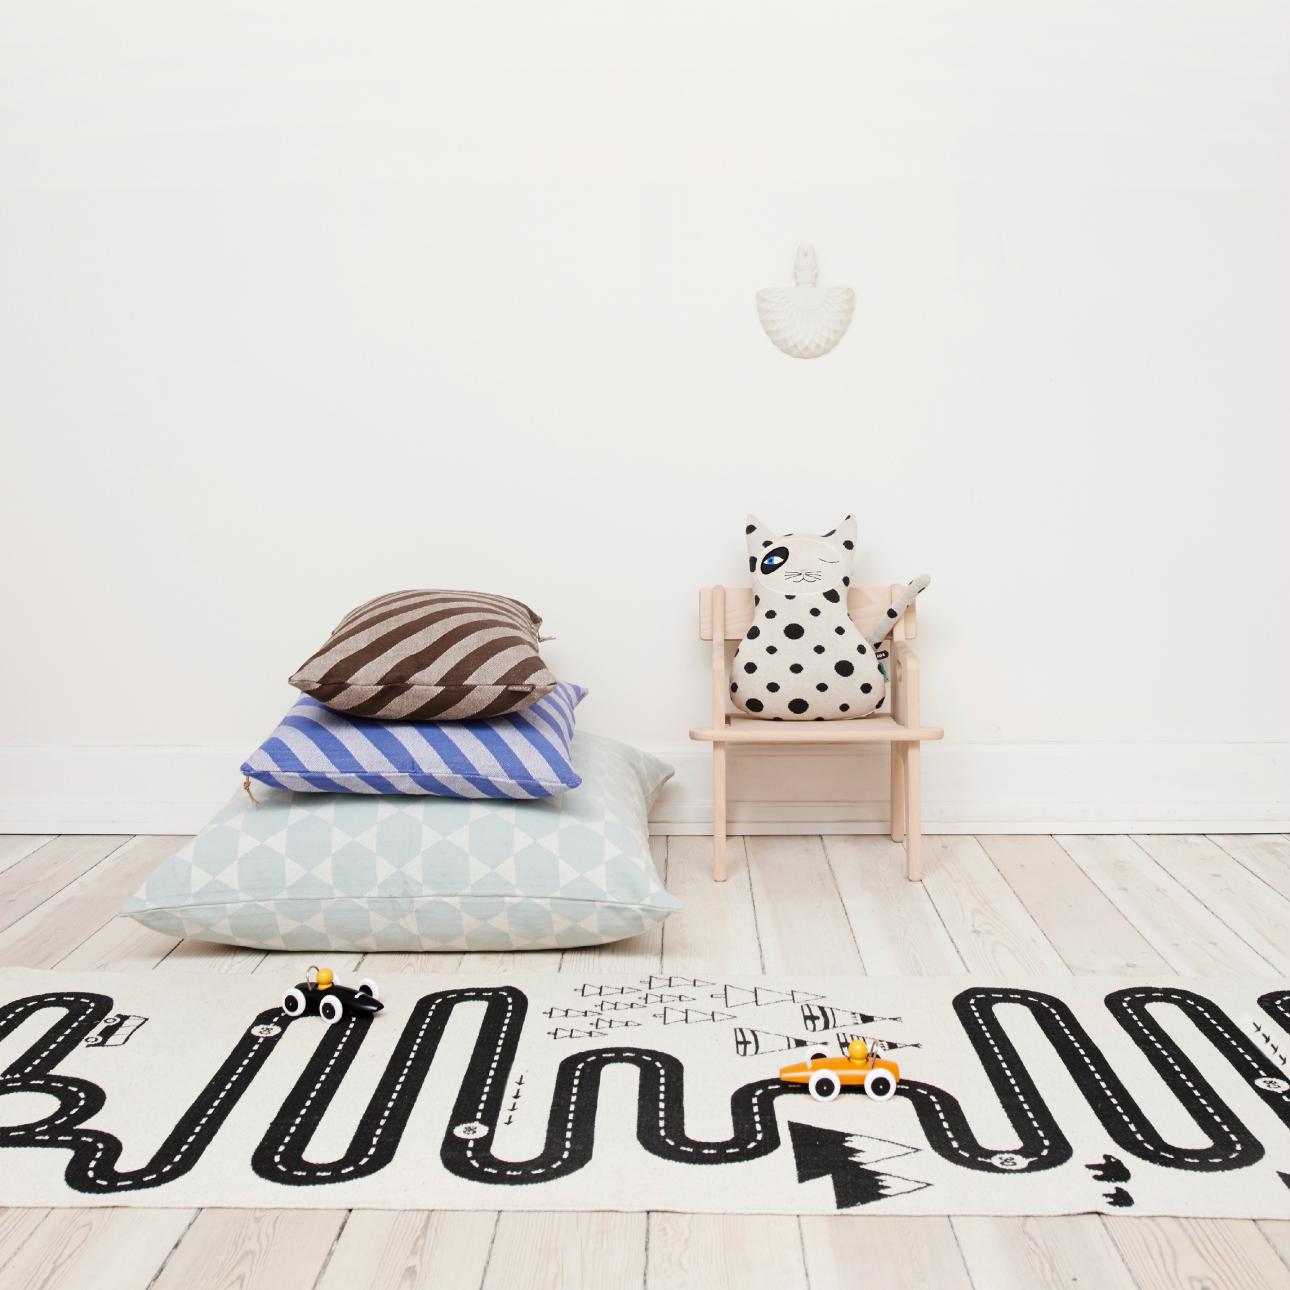 kinderkamer ideeen zwart-wit vloerkleed van OYOY mini